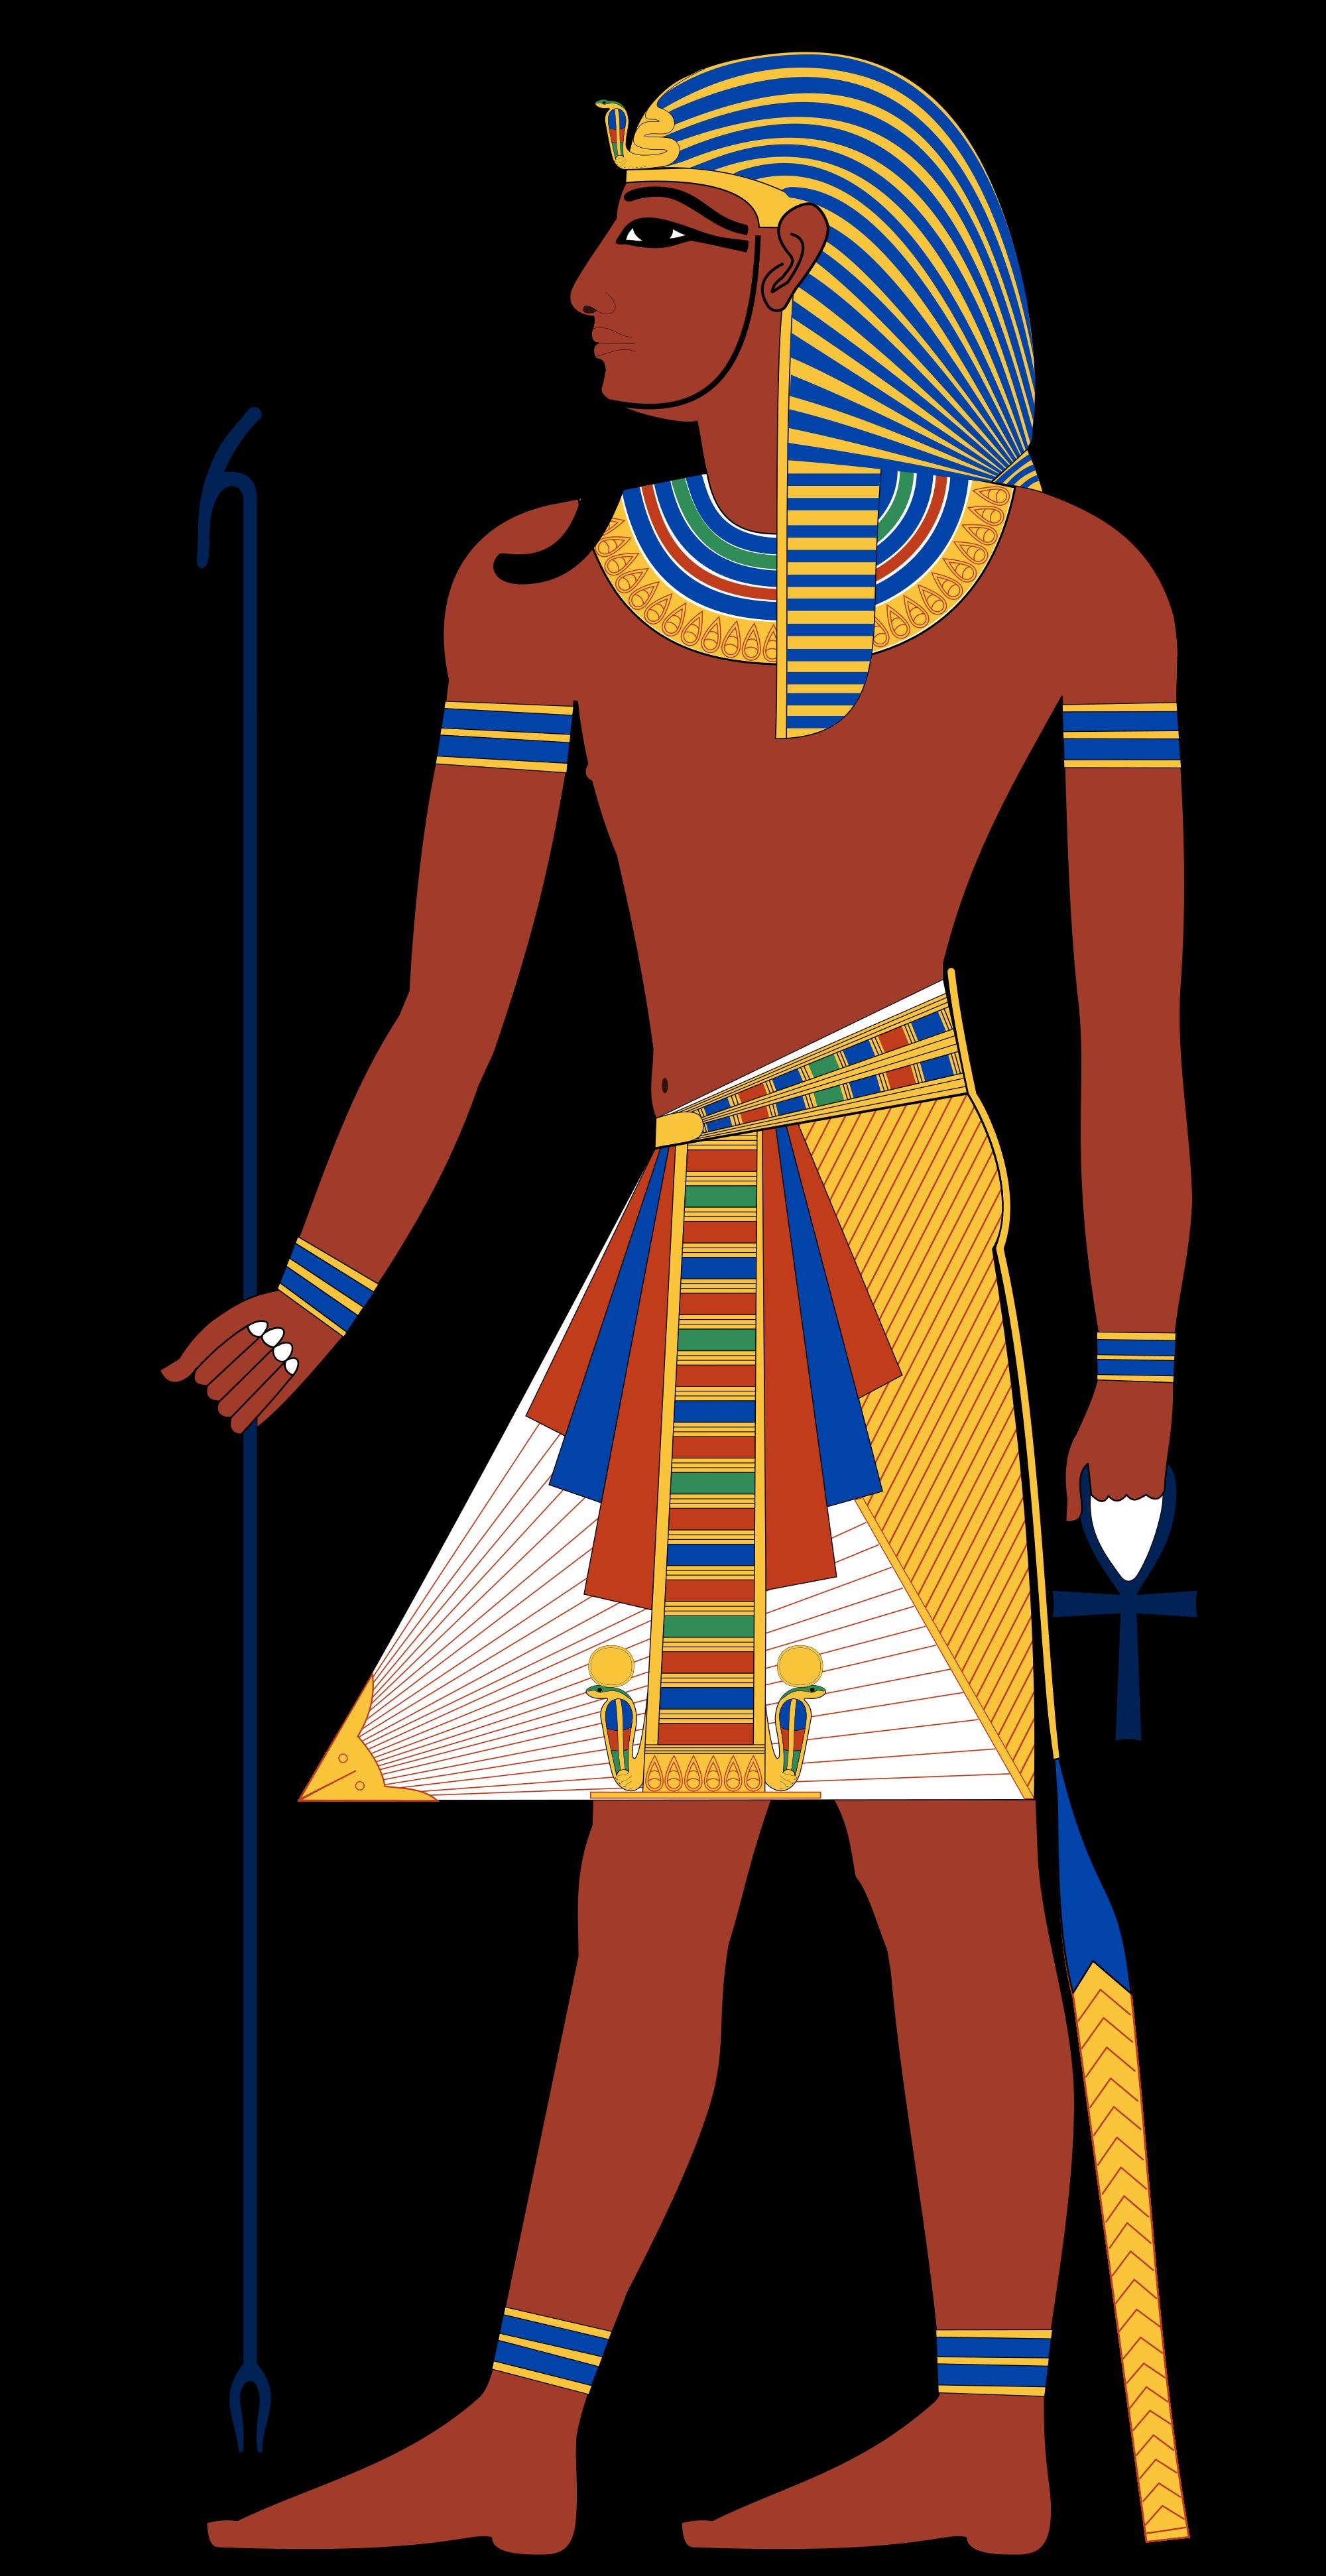 Pharaoh wikipedia. Respect clipart buddhist priest